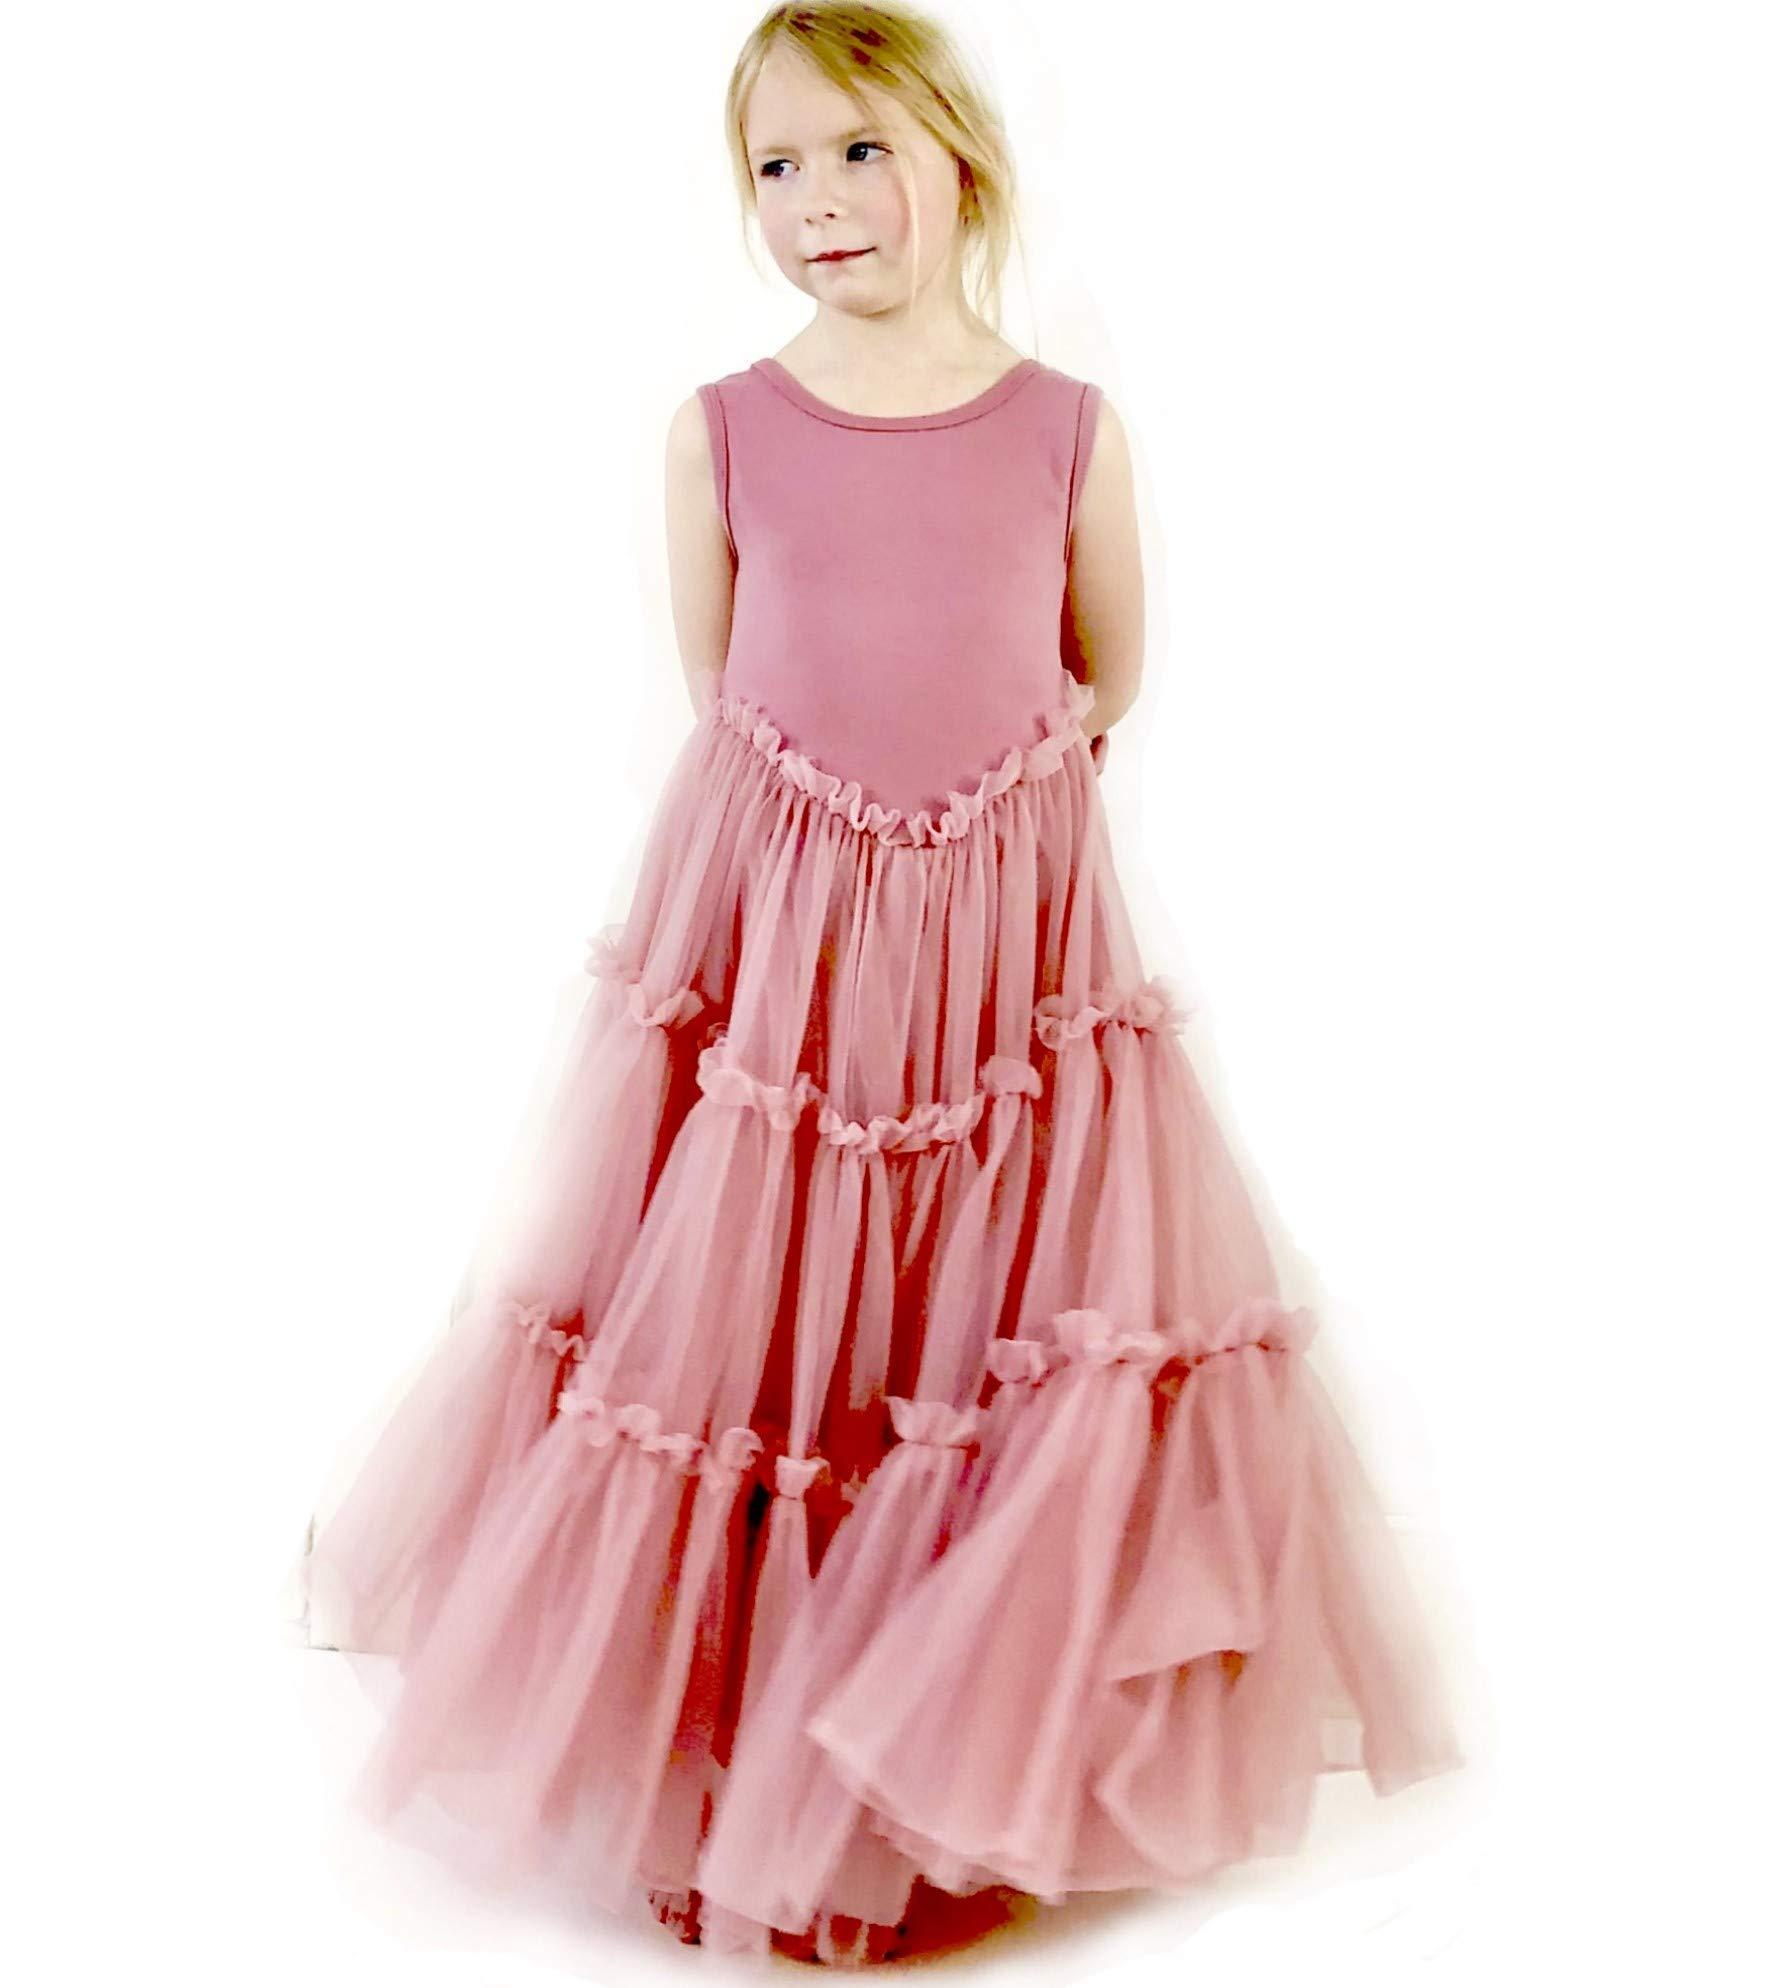 Jennifer and June Pink Fluffy Layered Tutu Flower Girl Ballerina Toddler Dress. (4T - 5T) by Jennifer + June